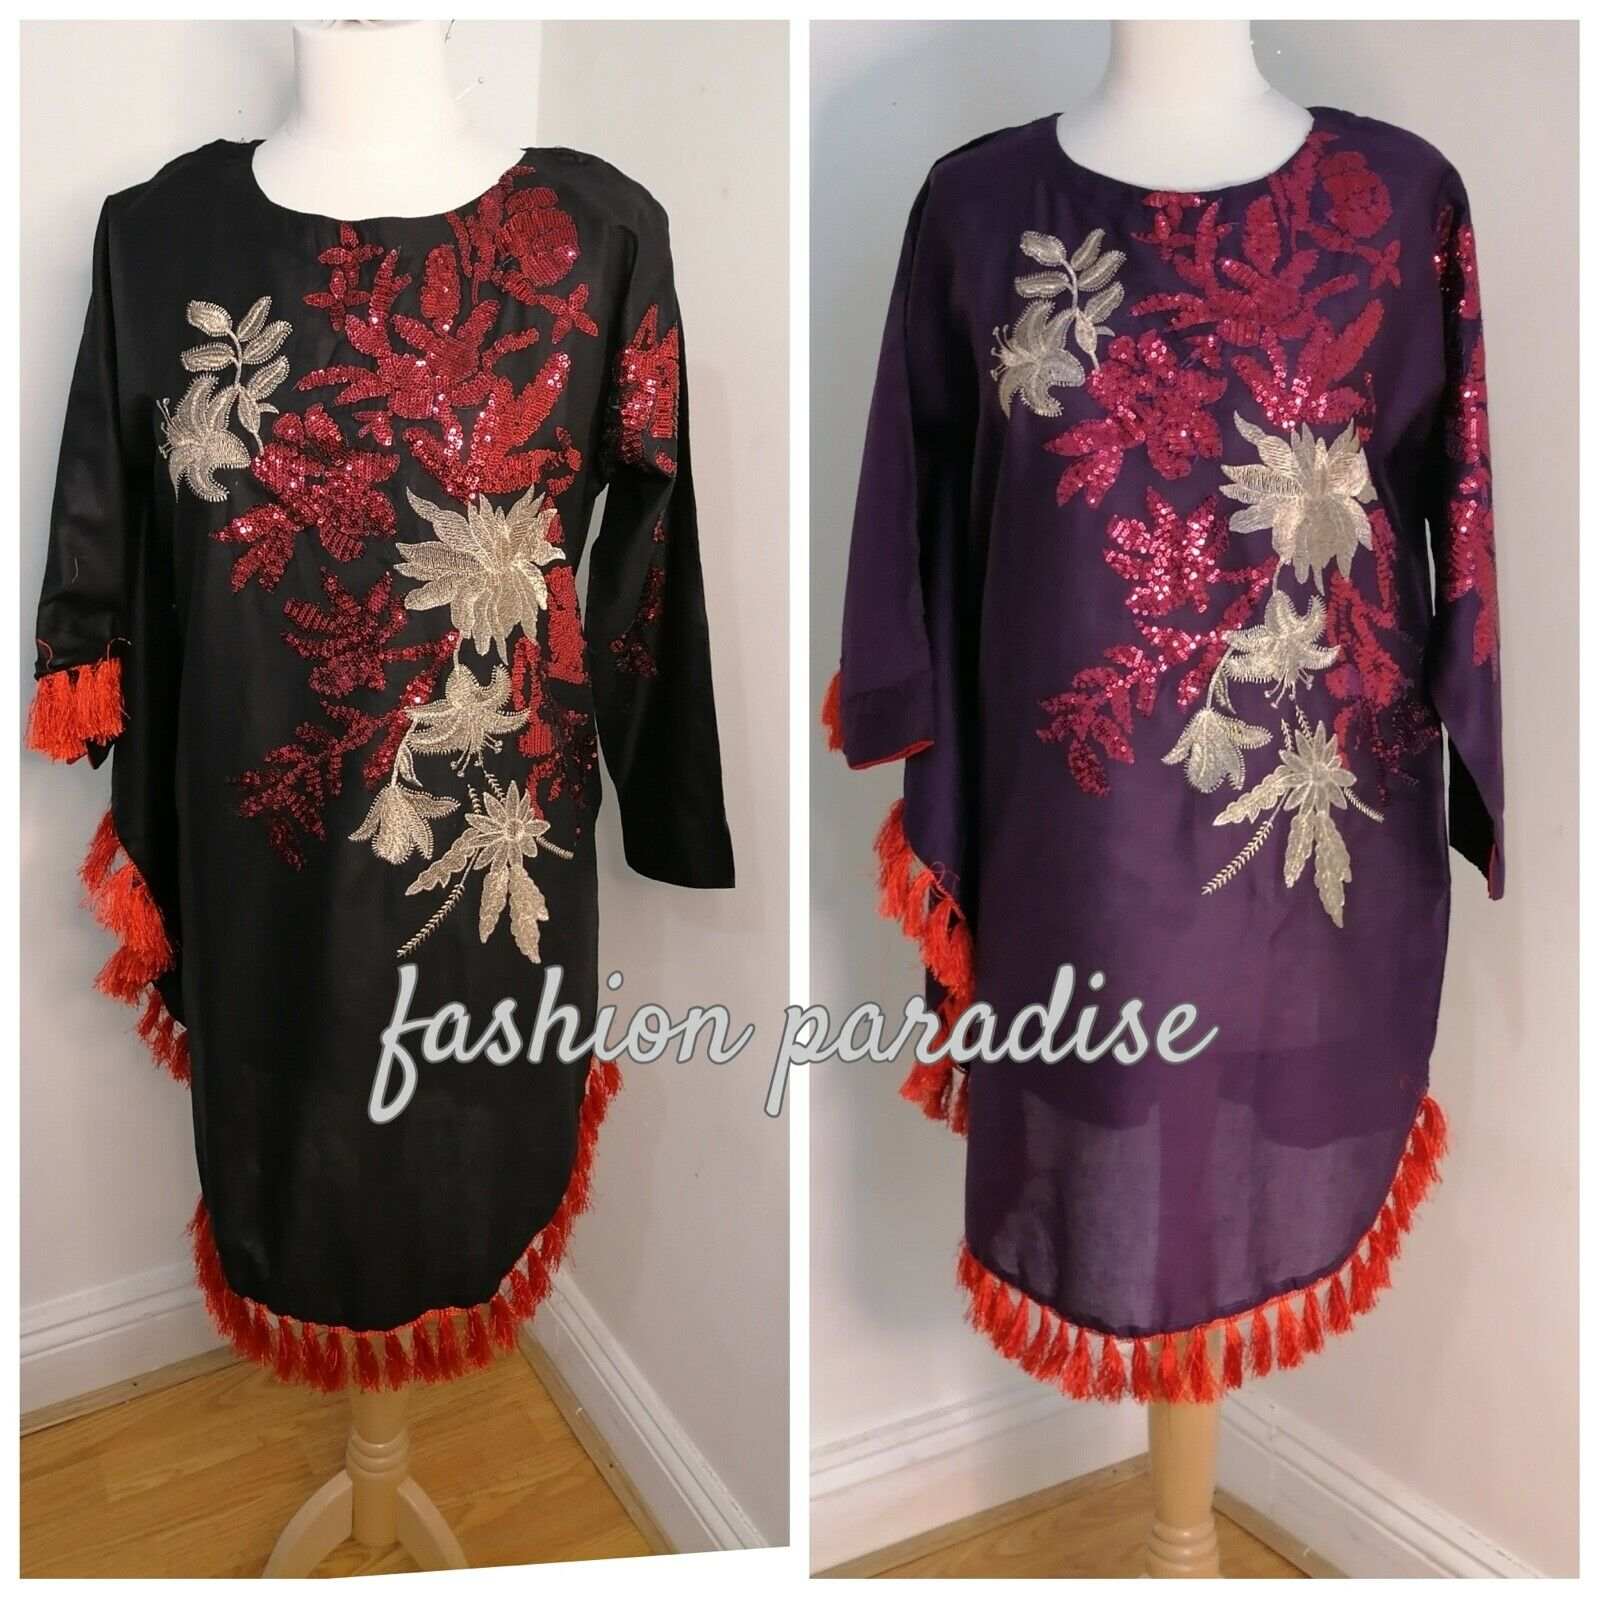 designer style kaftan embroidered ladies/women shirt/tunic/top Medium size